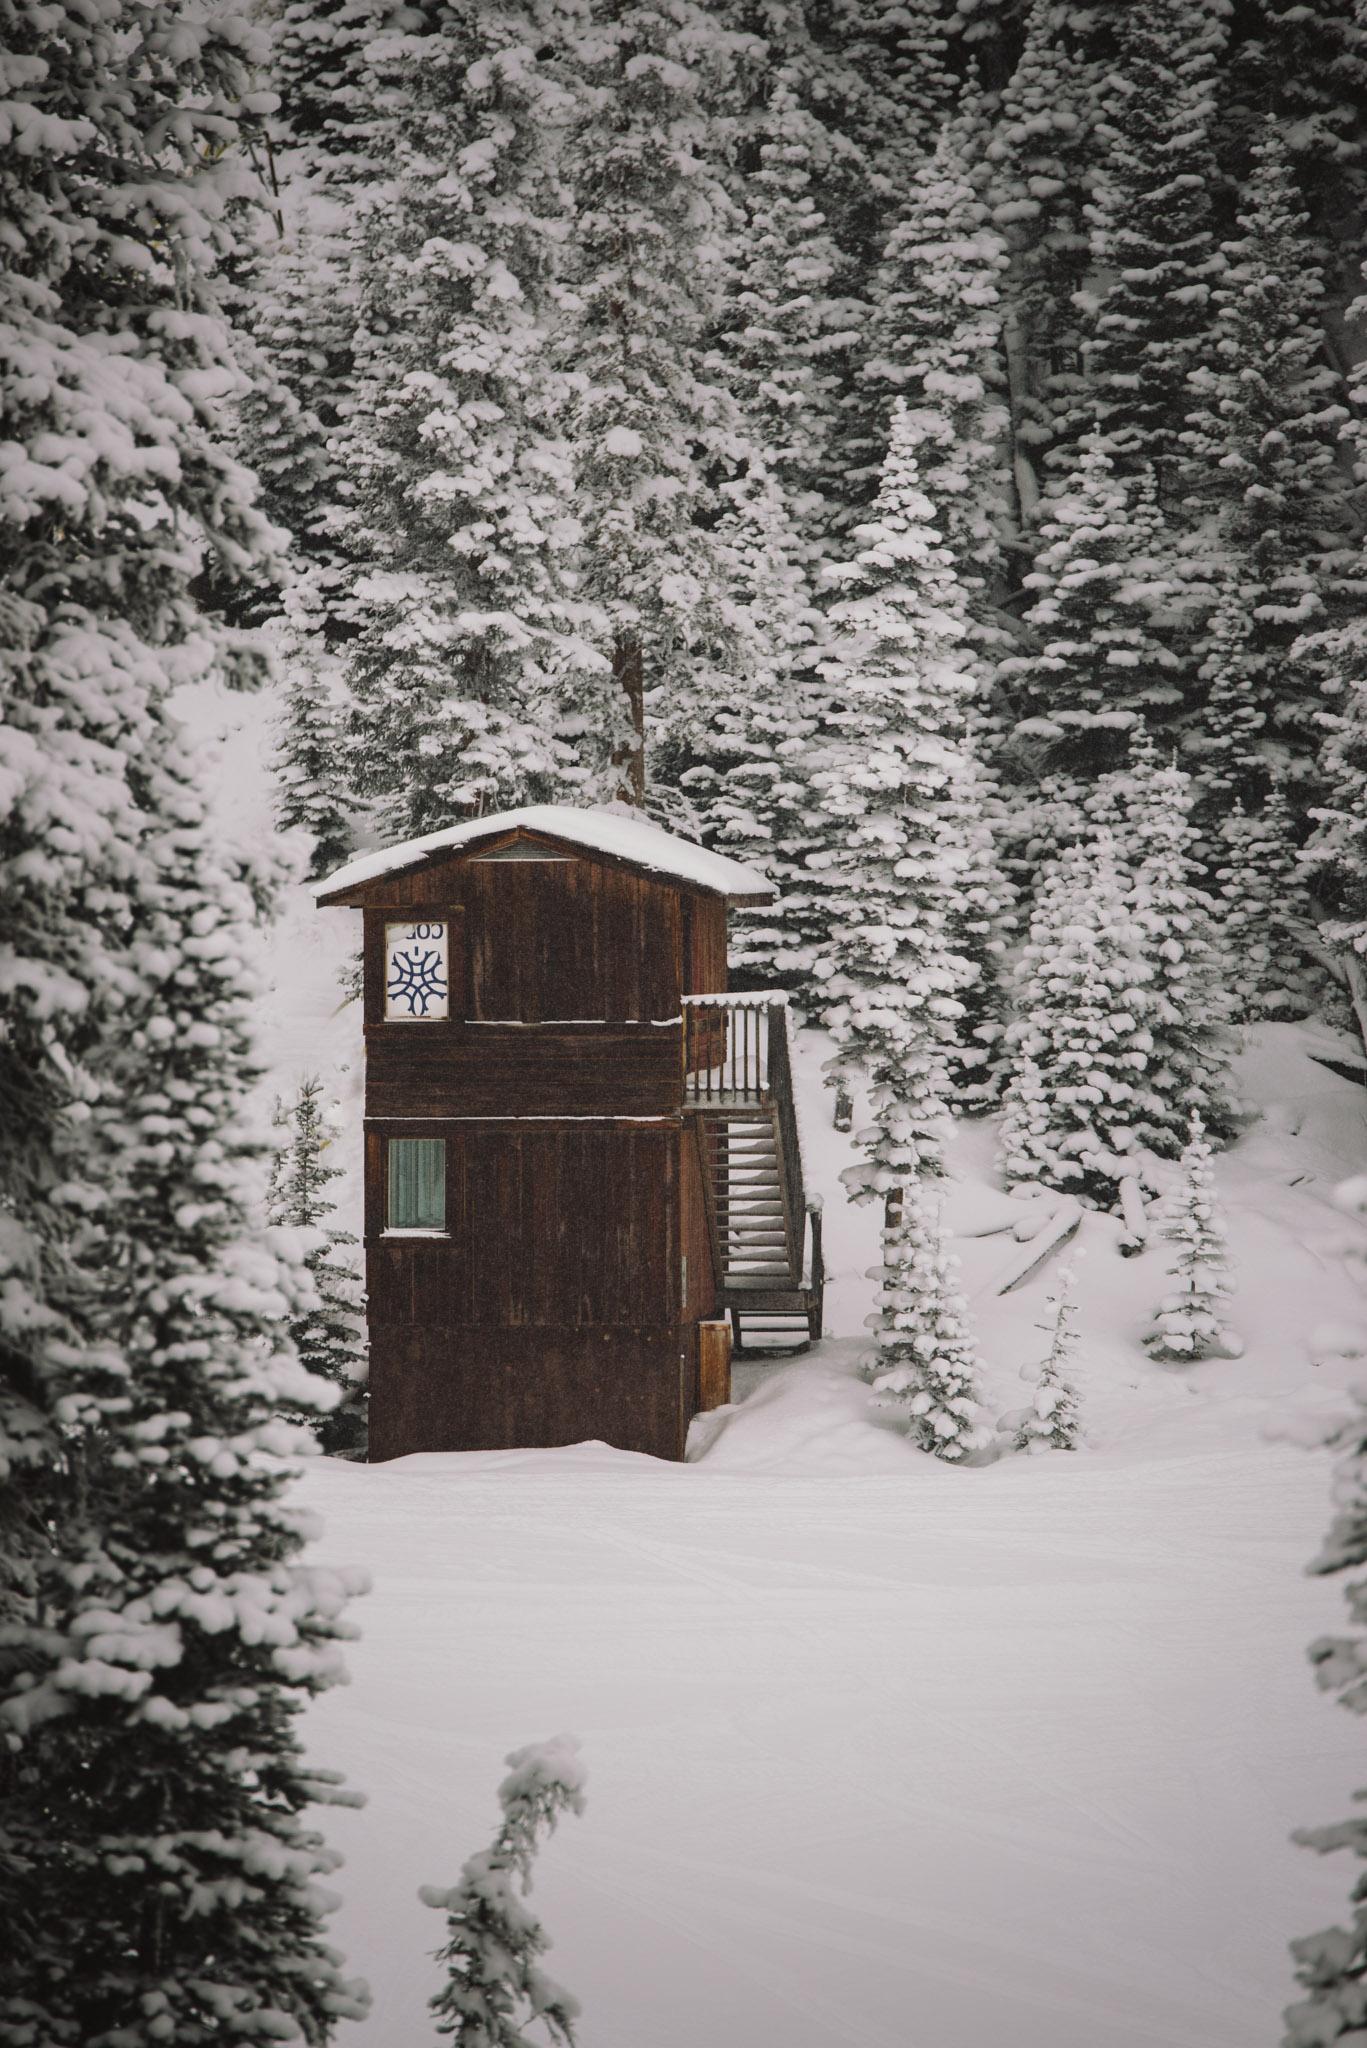 Chelsea Czibere - January 19, 2018 - Nakiska Ski Resort-35.jpg